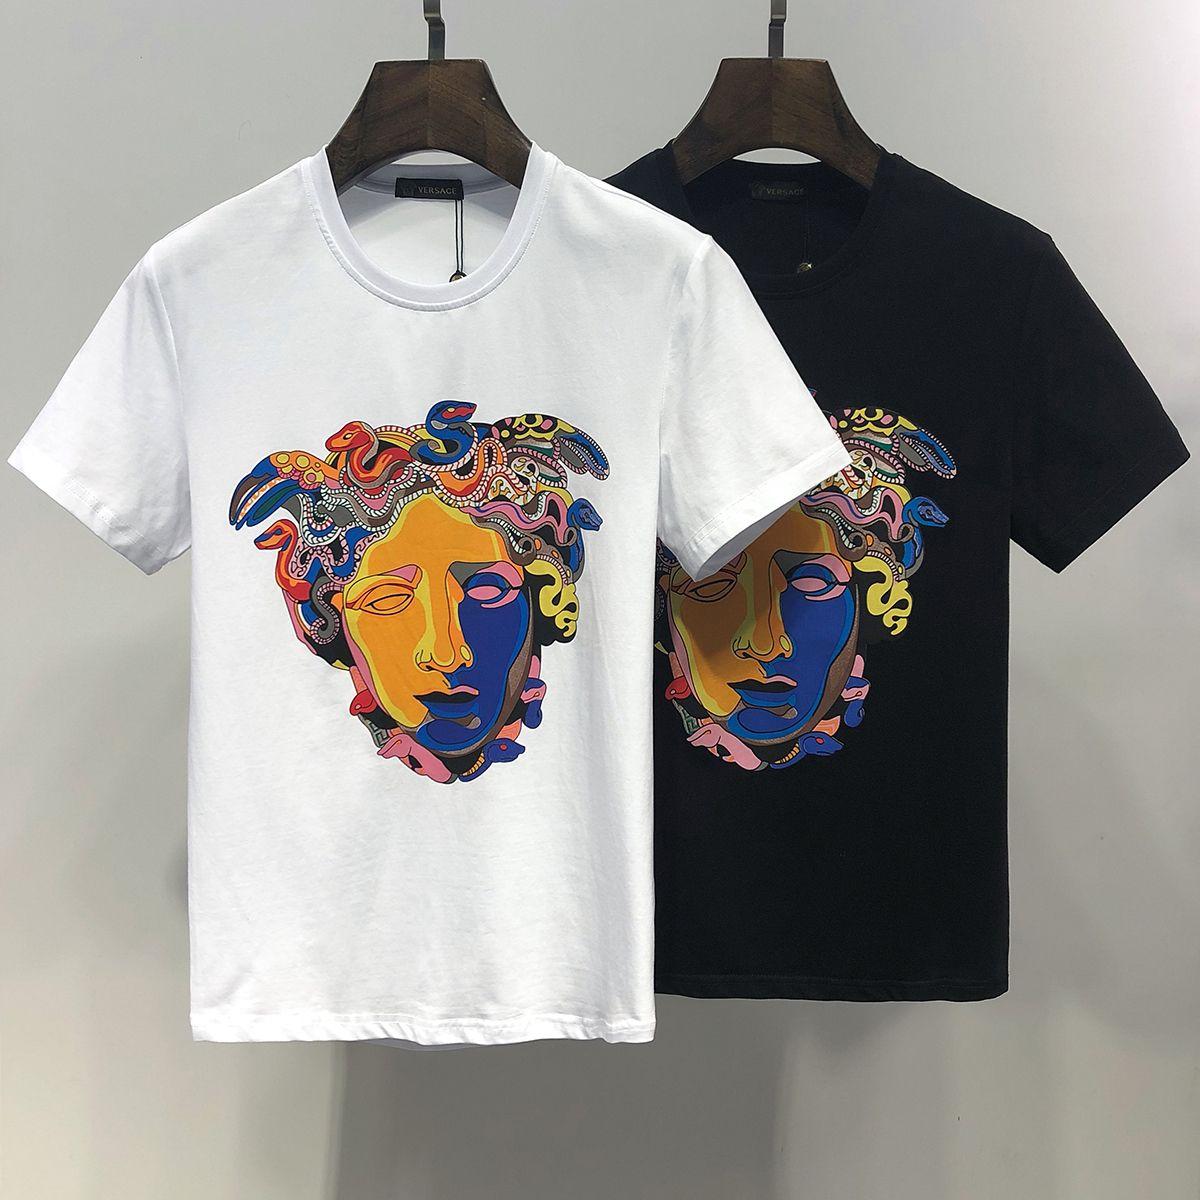 51d174fd 2019 Italy designer polo shirt Fashion Luxury Brand medusa t shirts mens  Casual Cotton polos with embroidery Medusa t-shirt applique Q-1